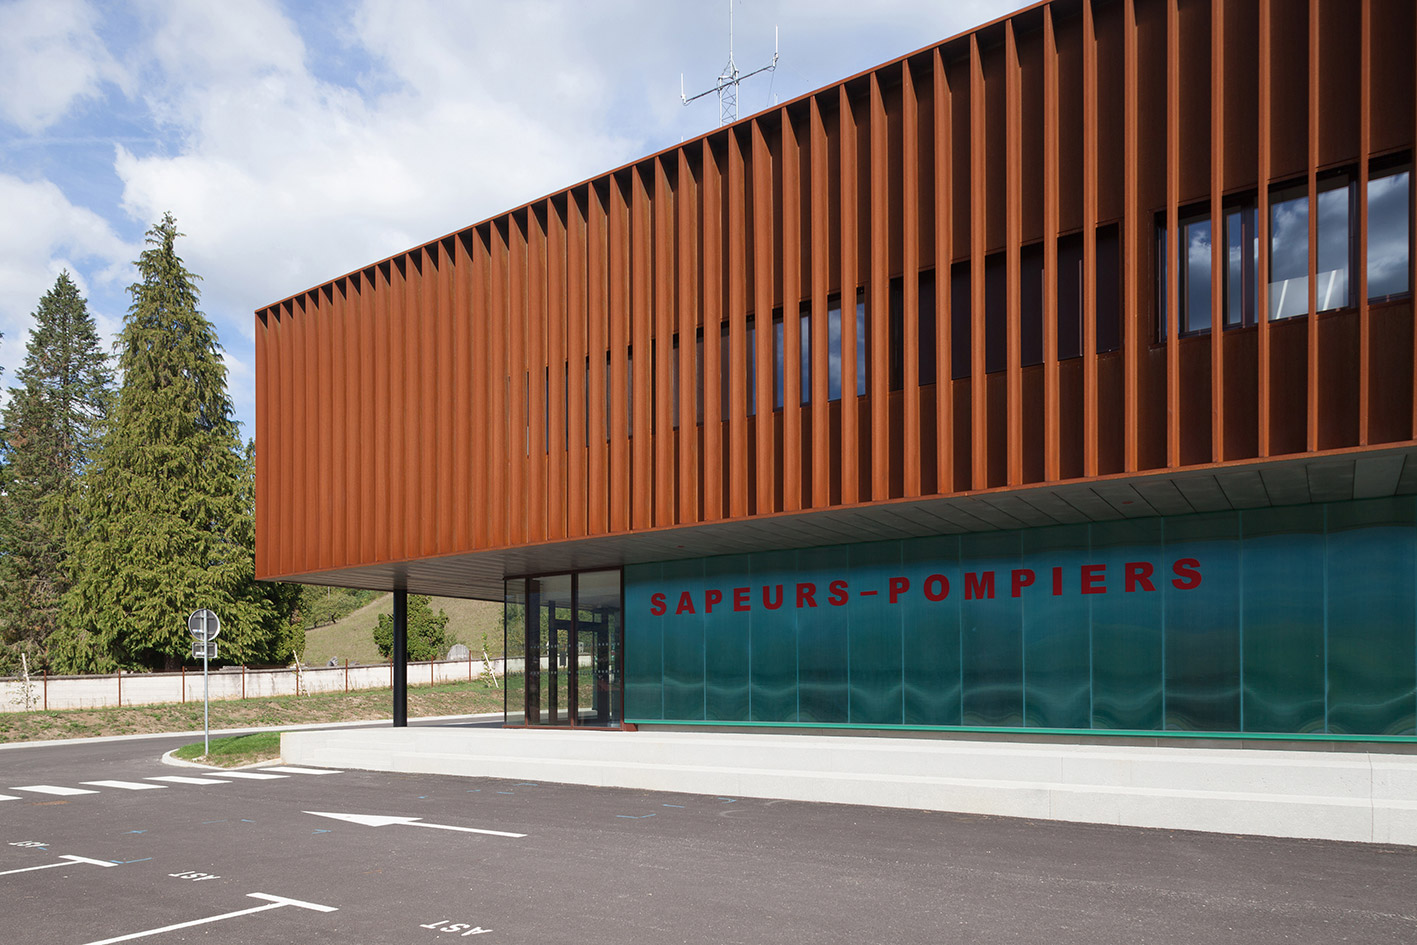 jerome-ricolleau-photographe-architecture-lyon-Composite-grenoble-sdis-caserne-pompiers-seyssel-5